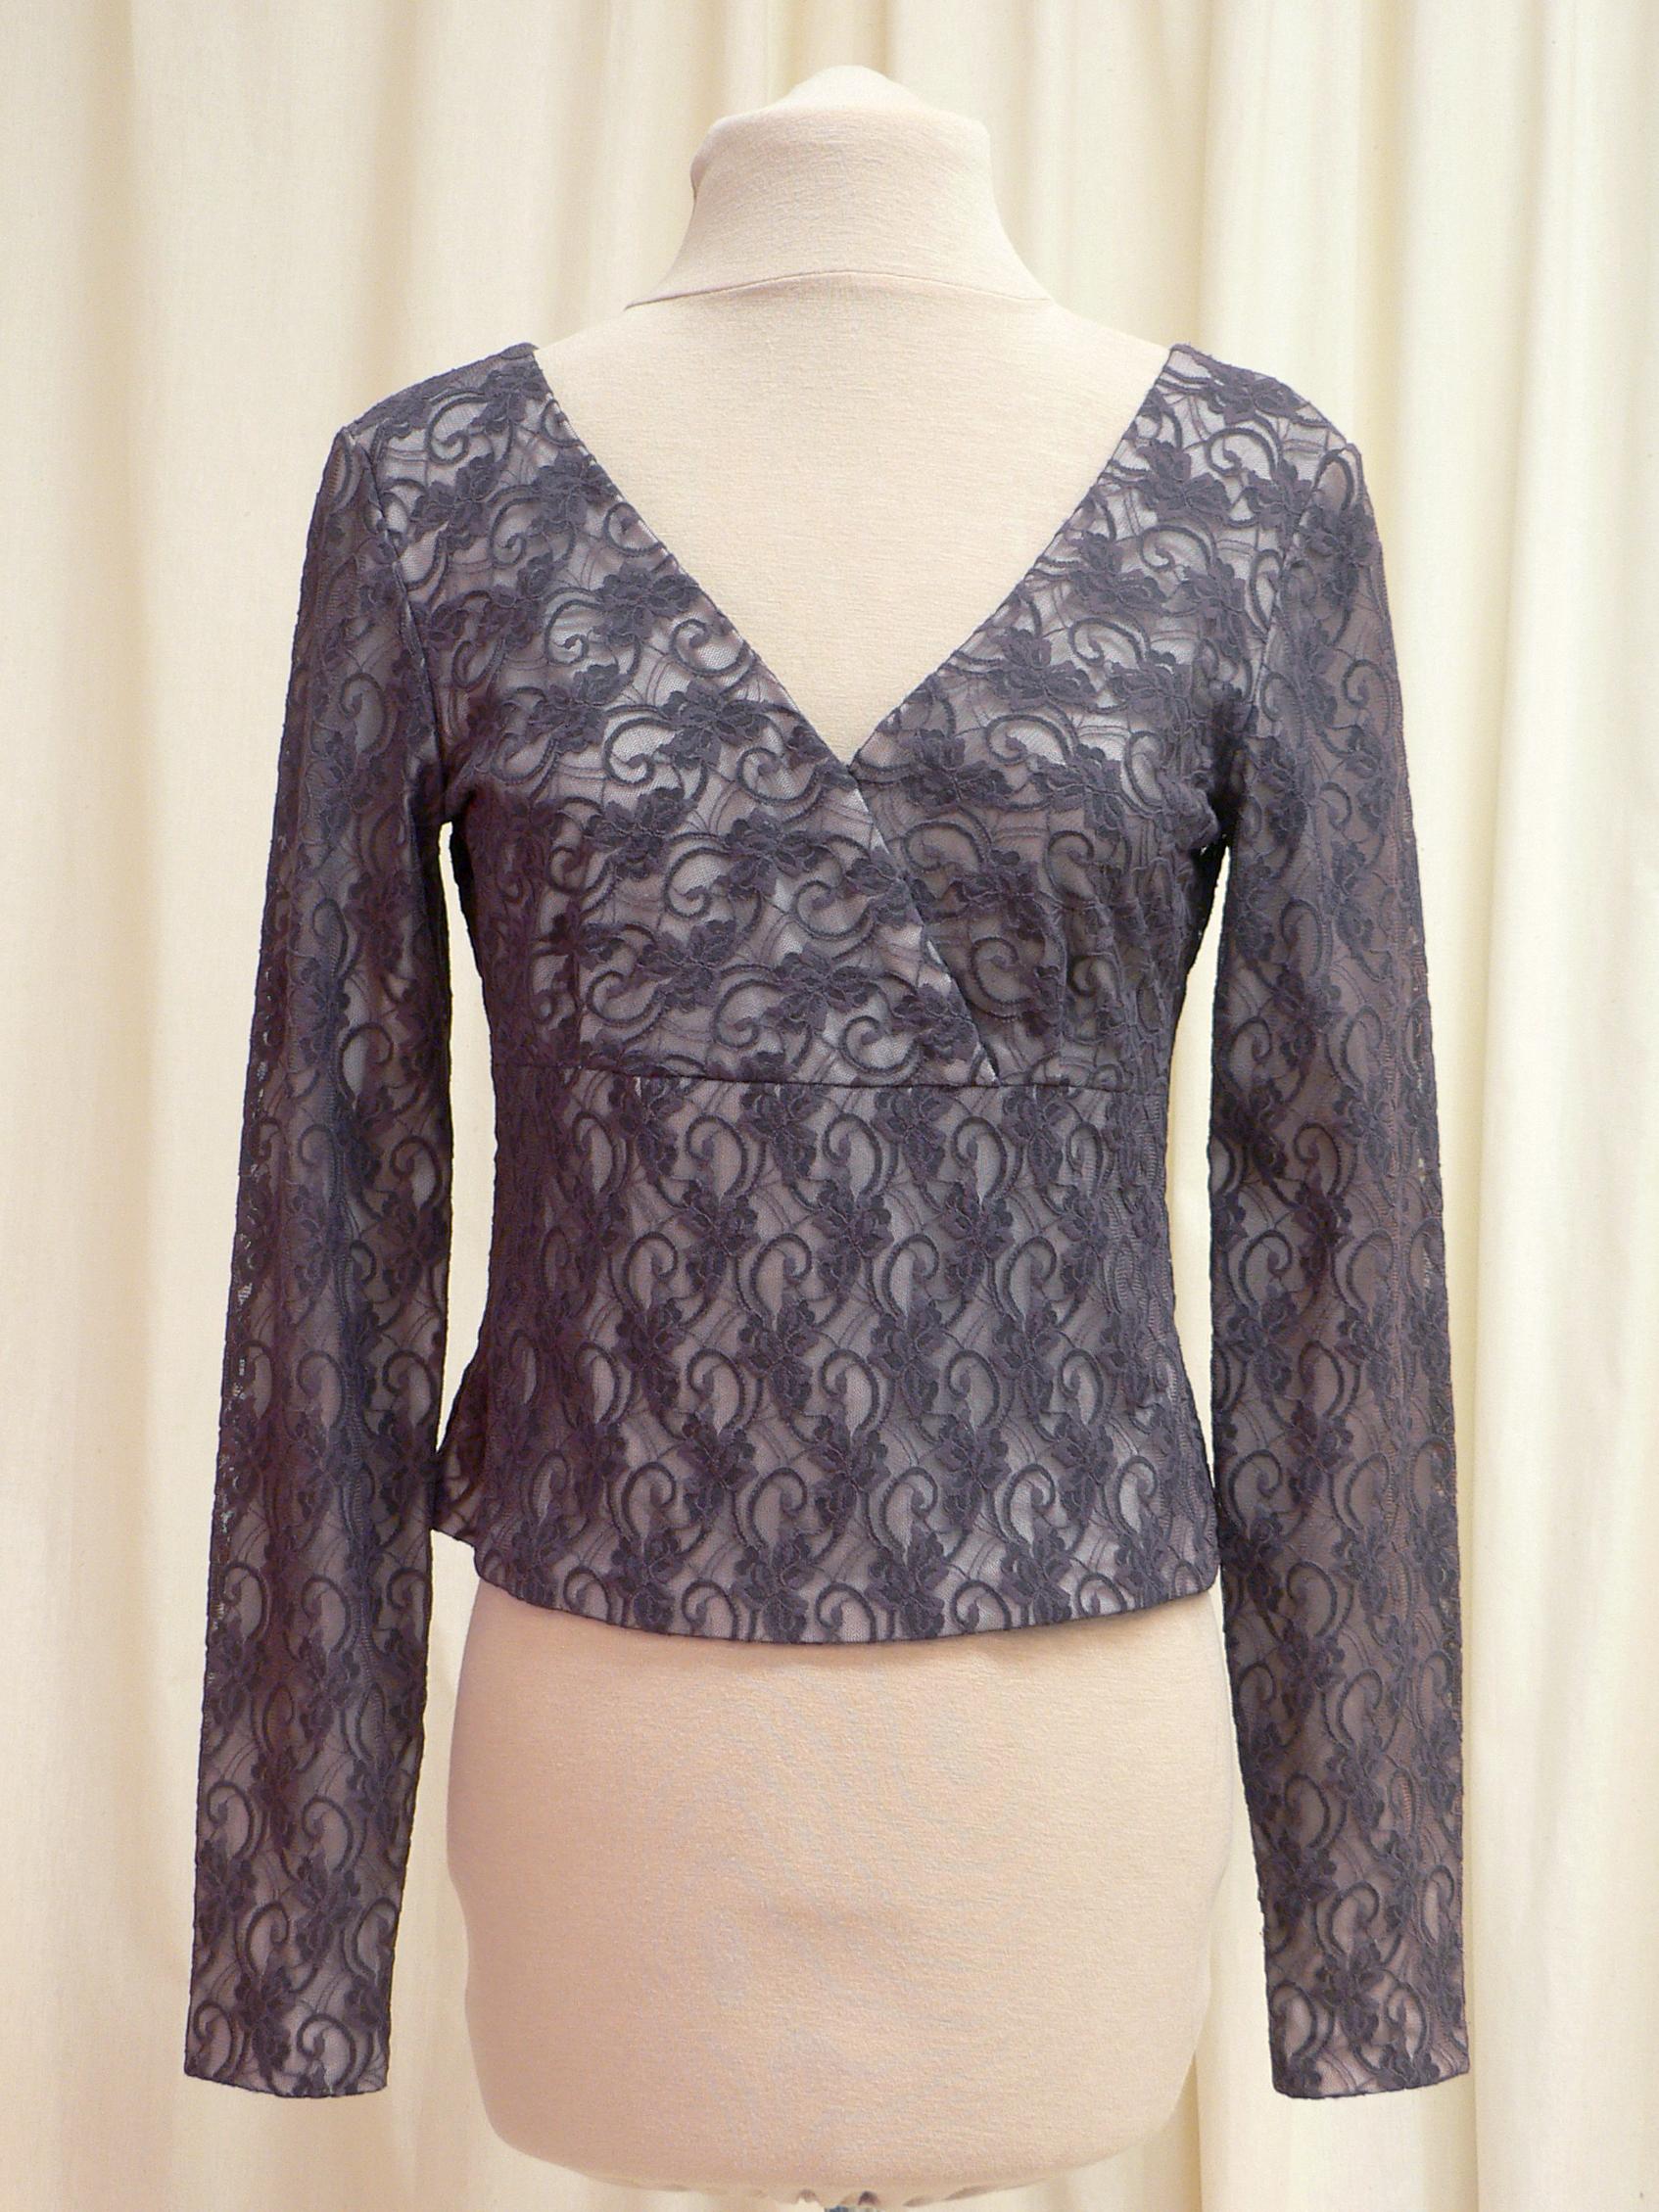 blouse02_front.jpg